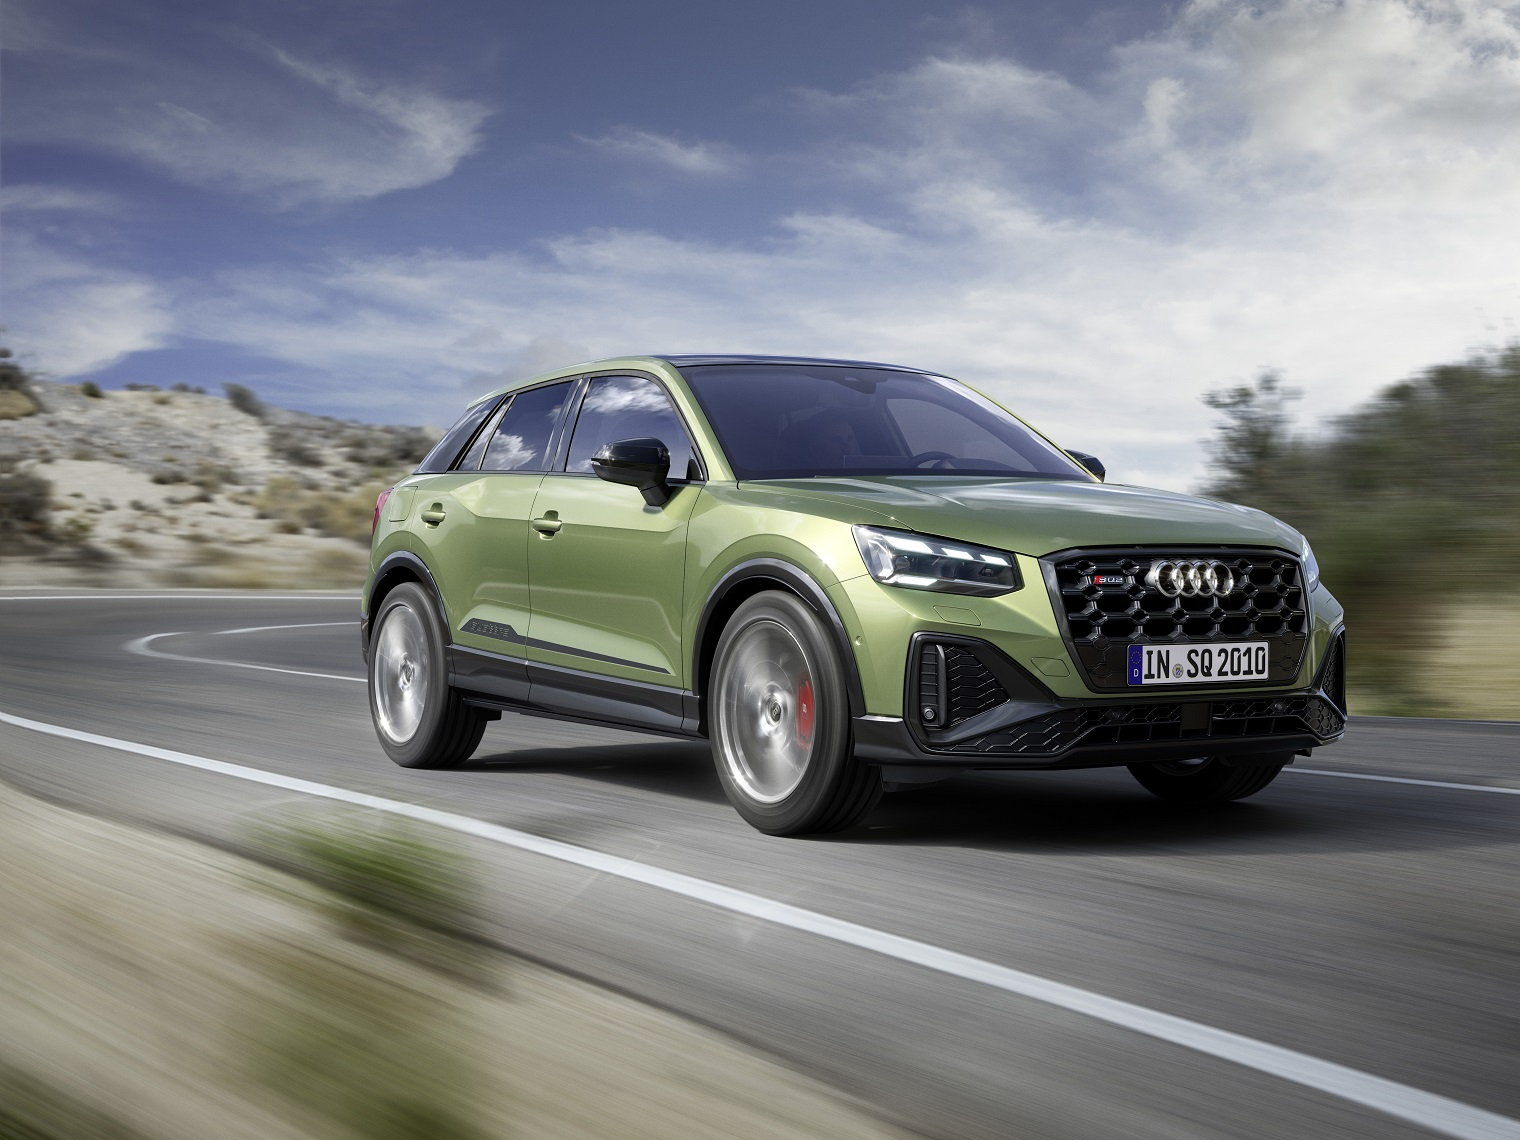 nuova-Audi-SQ2